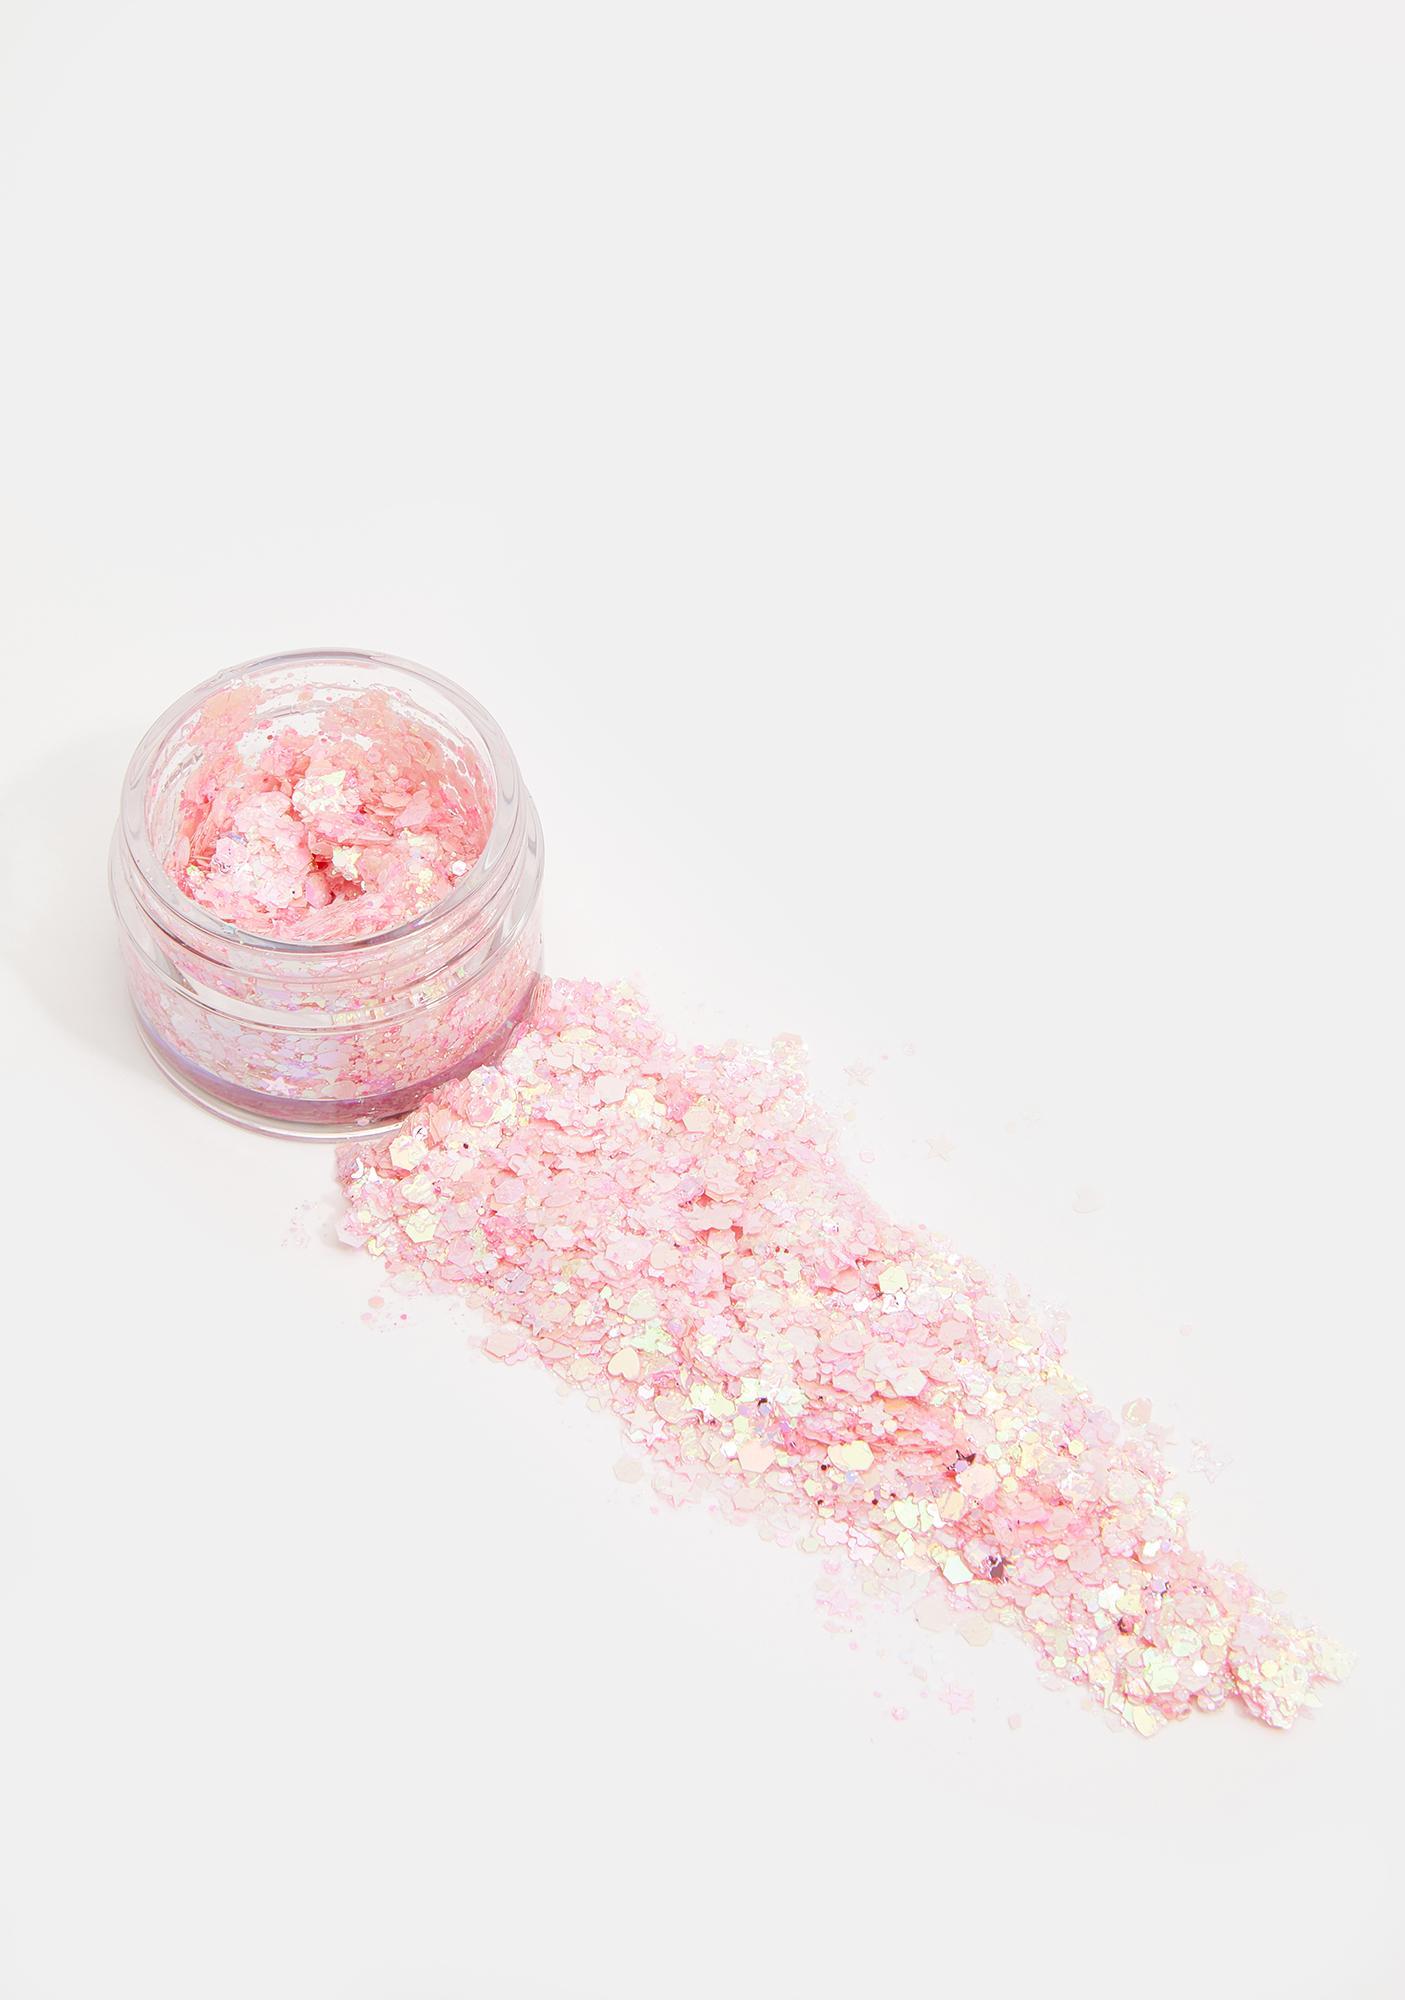 Uniglitter Cotton Candy Pink UV Unicorn Glitter Gel